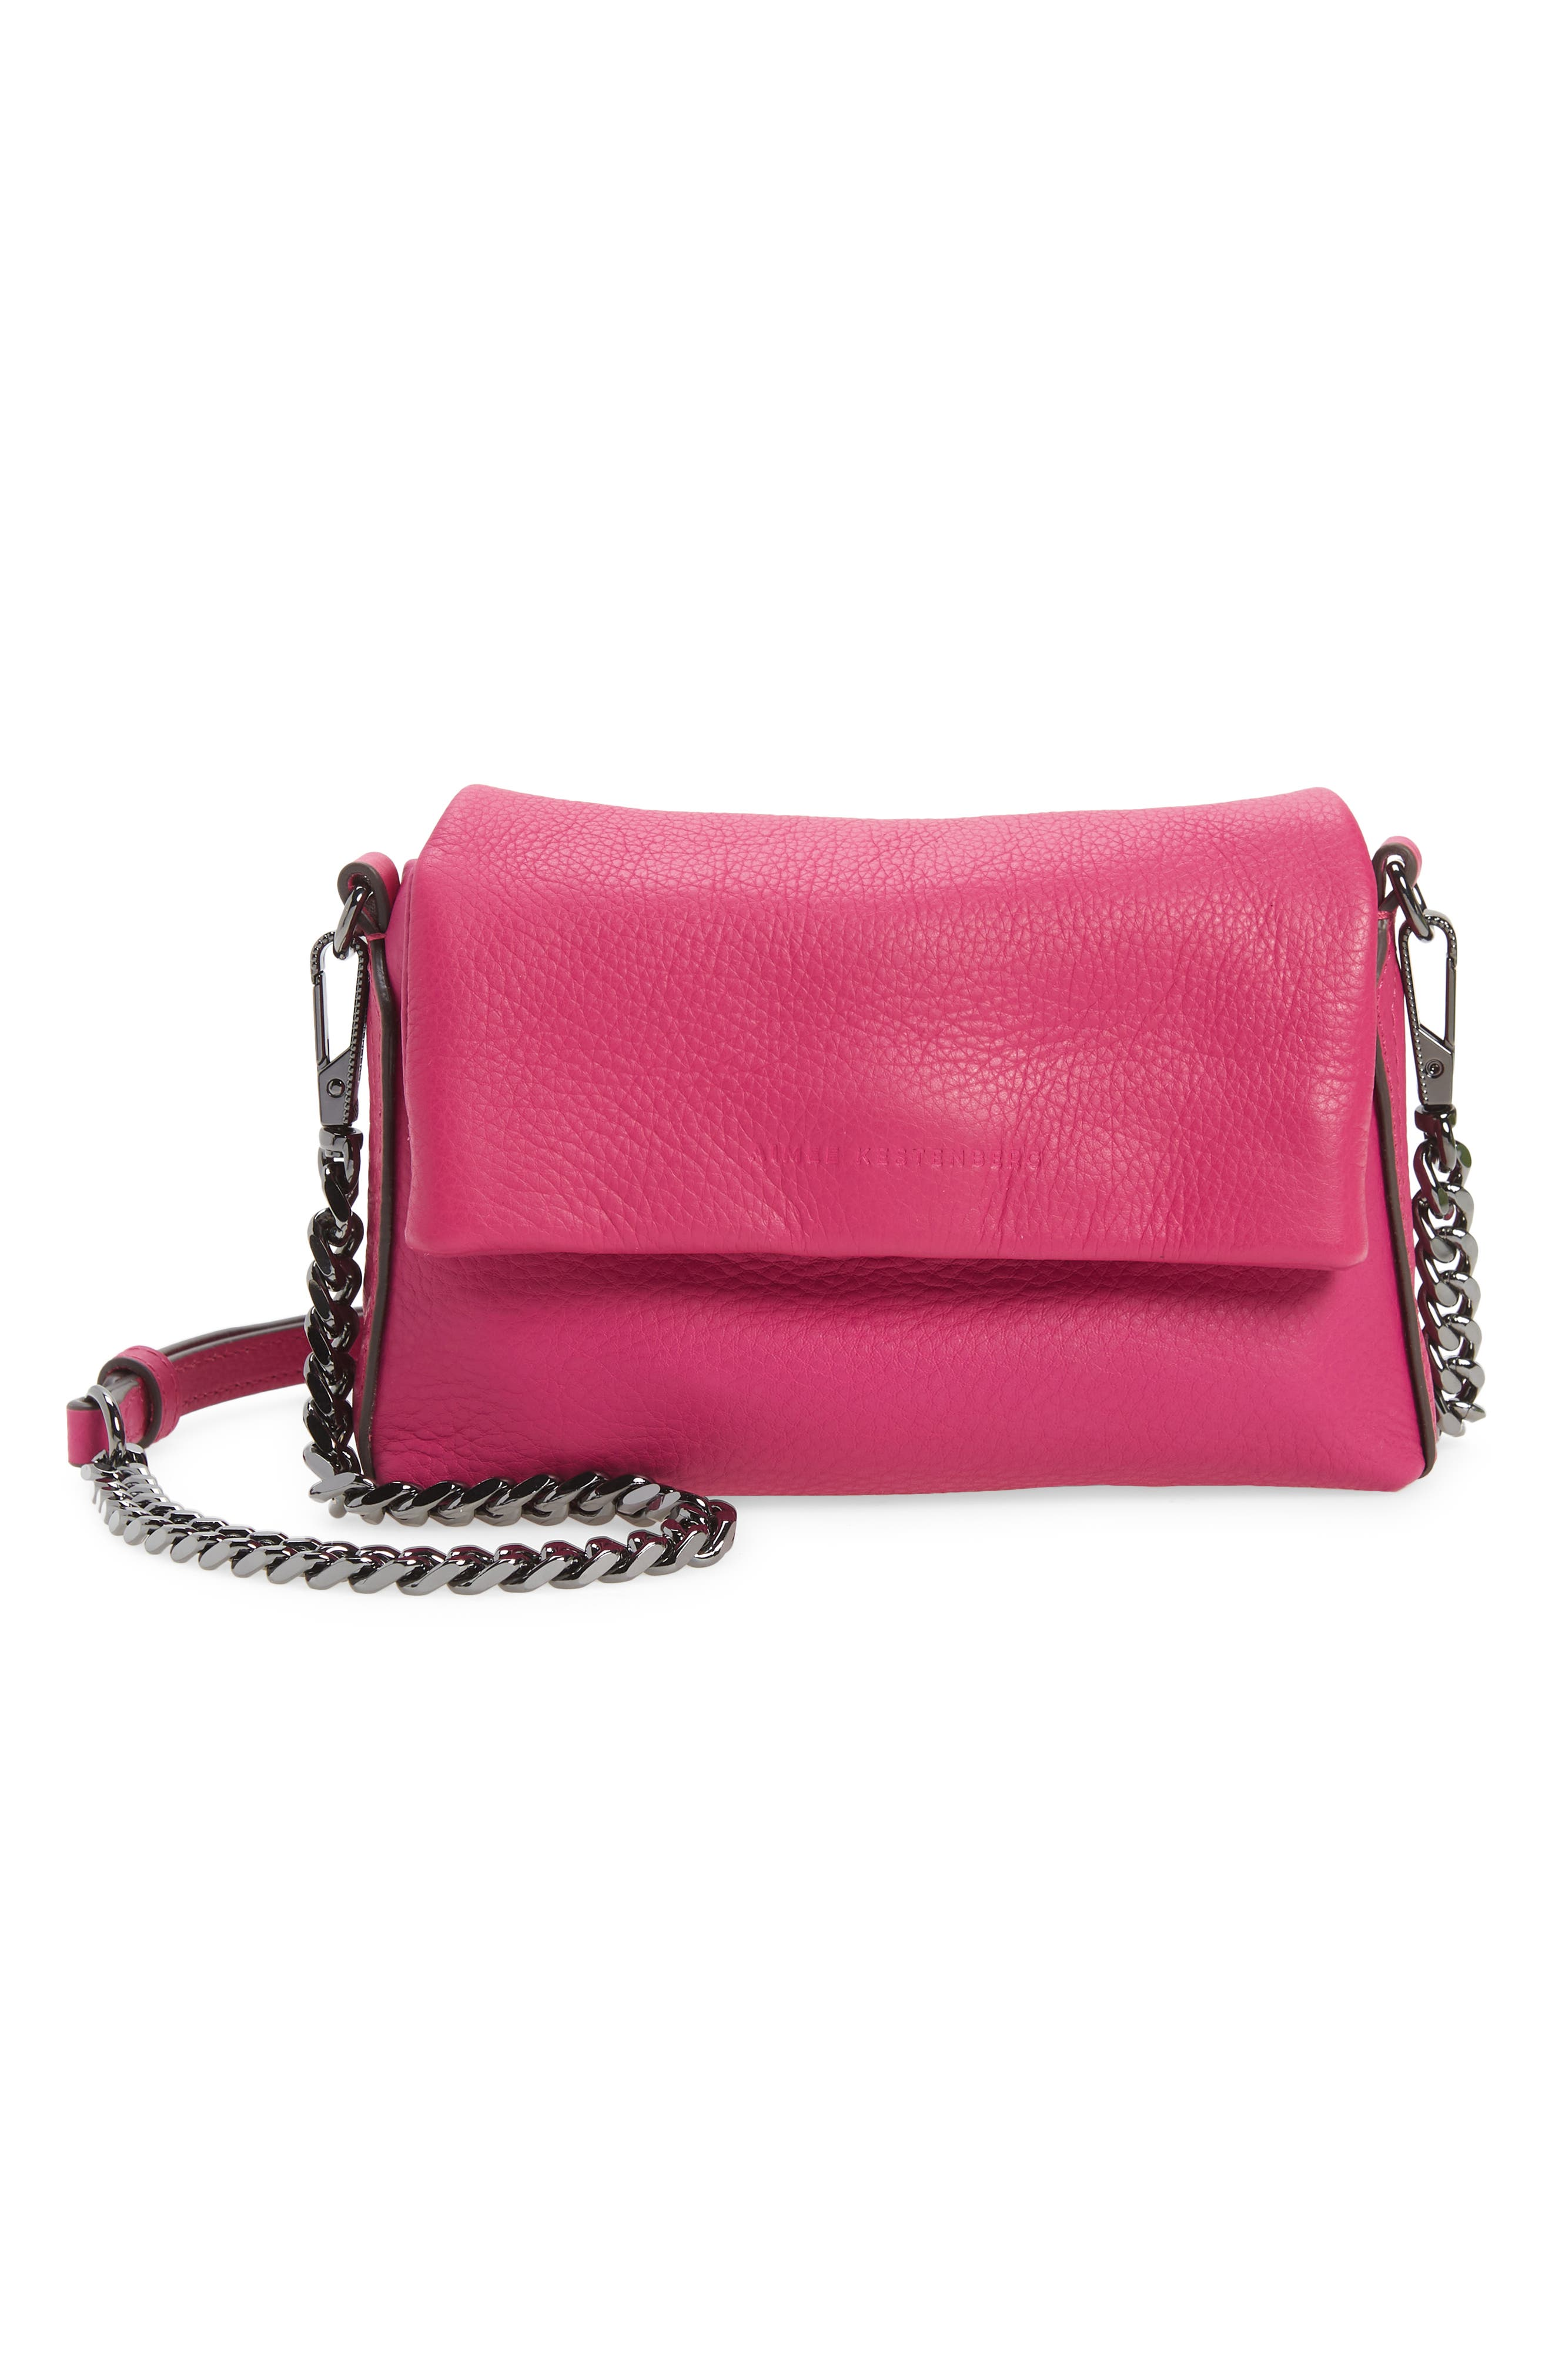 Nordy Leather Mini Crossbody Bag